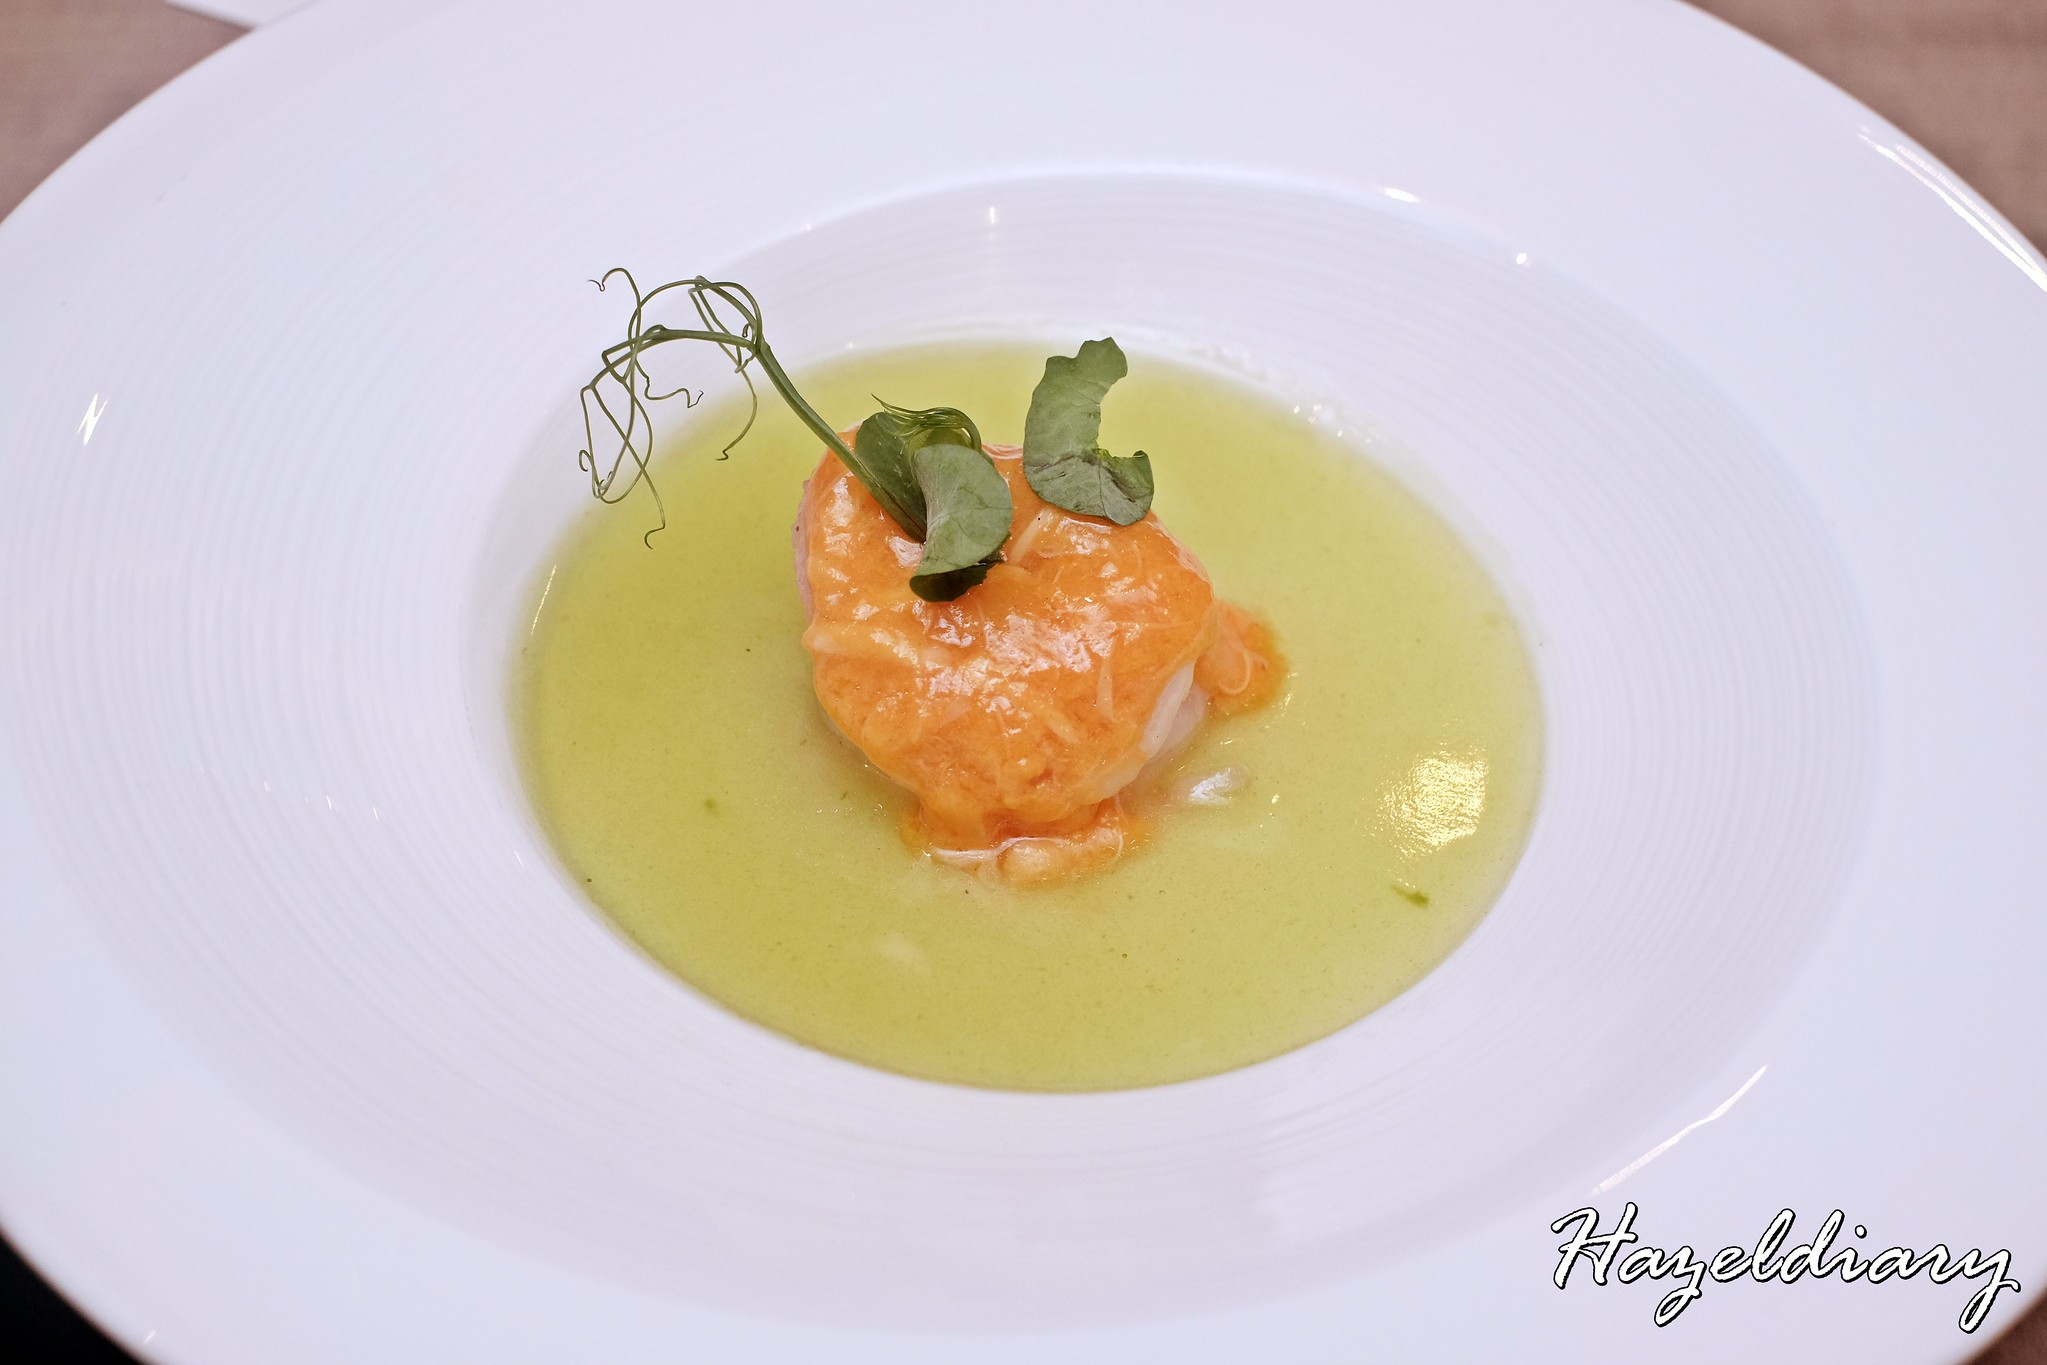 Jiang Nan Chun-Four Seasons Hotel Singapore- Winter Menu 2019-Steamed Prawn with Crab Roe and Jade Sauce on Egg White